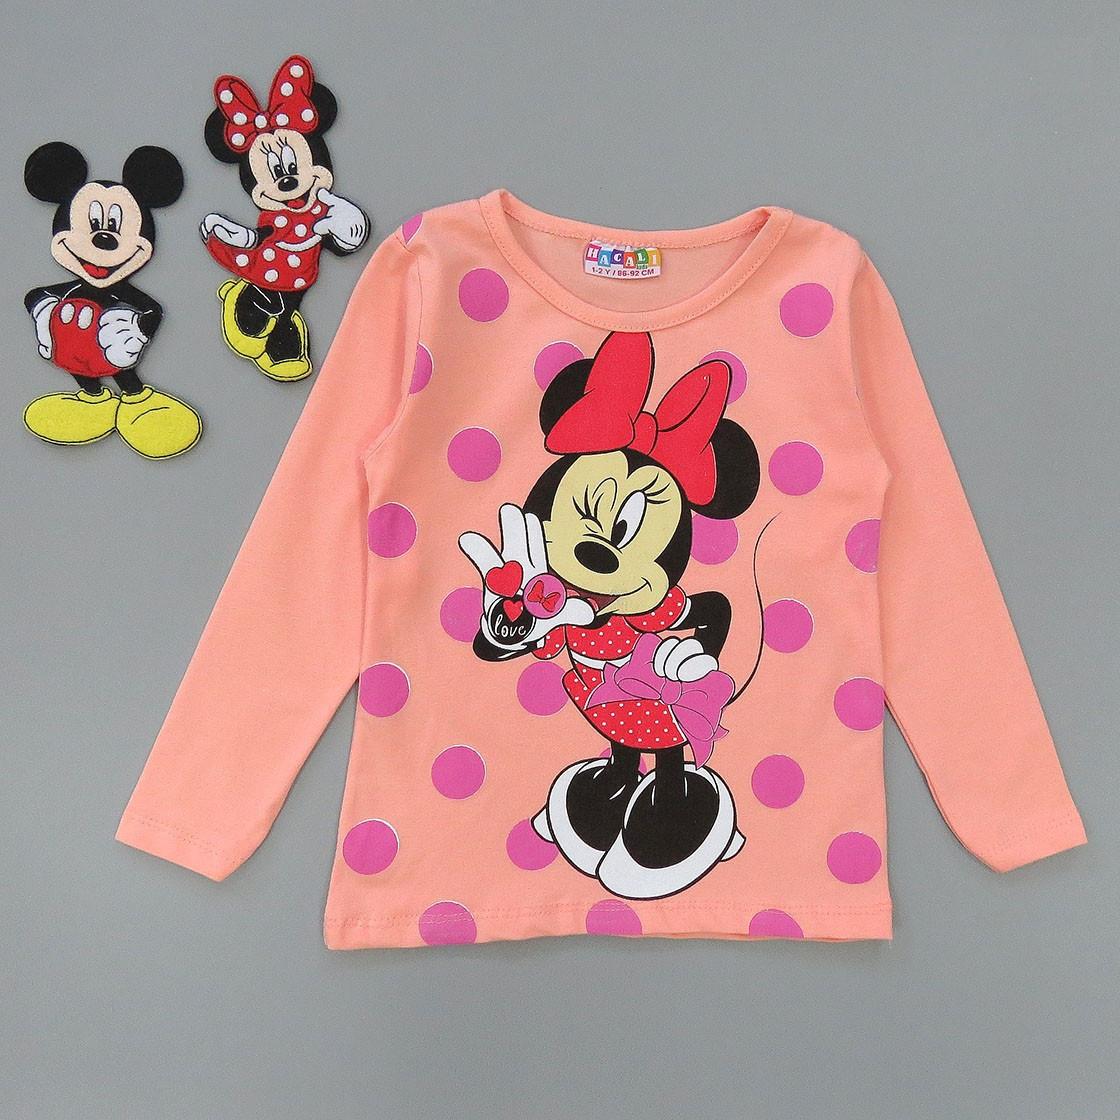 Лонгслив Minnie Mouse для девочки.